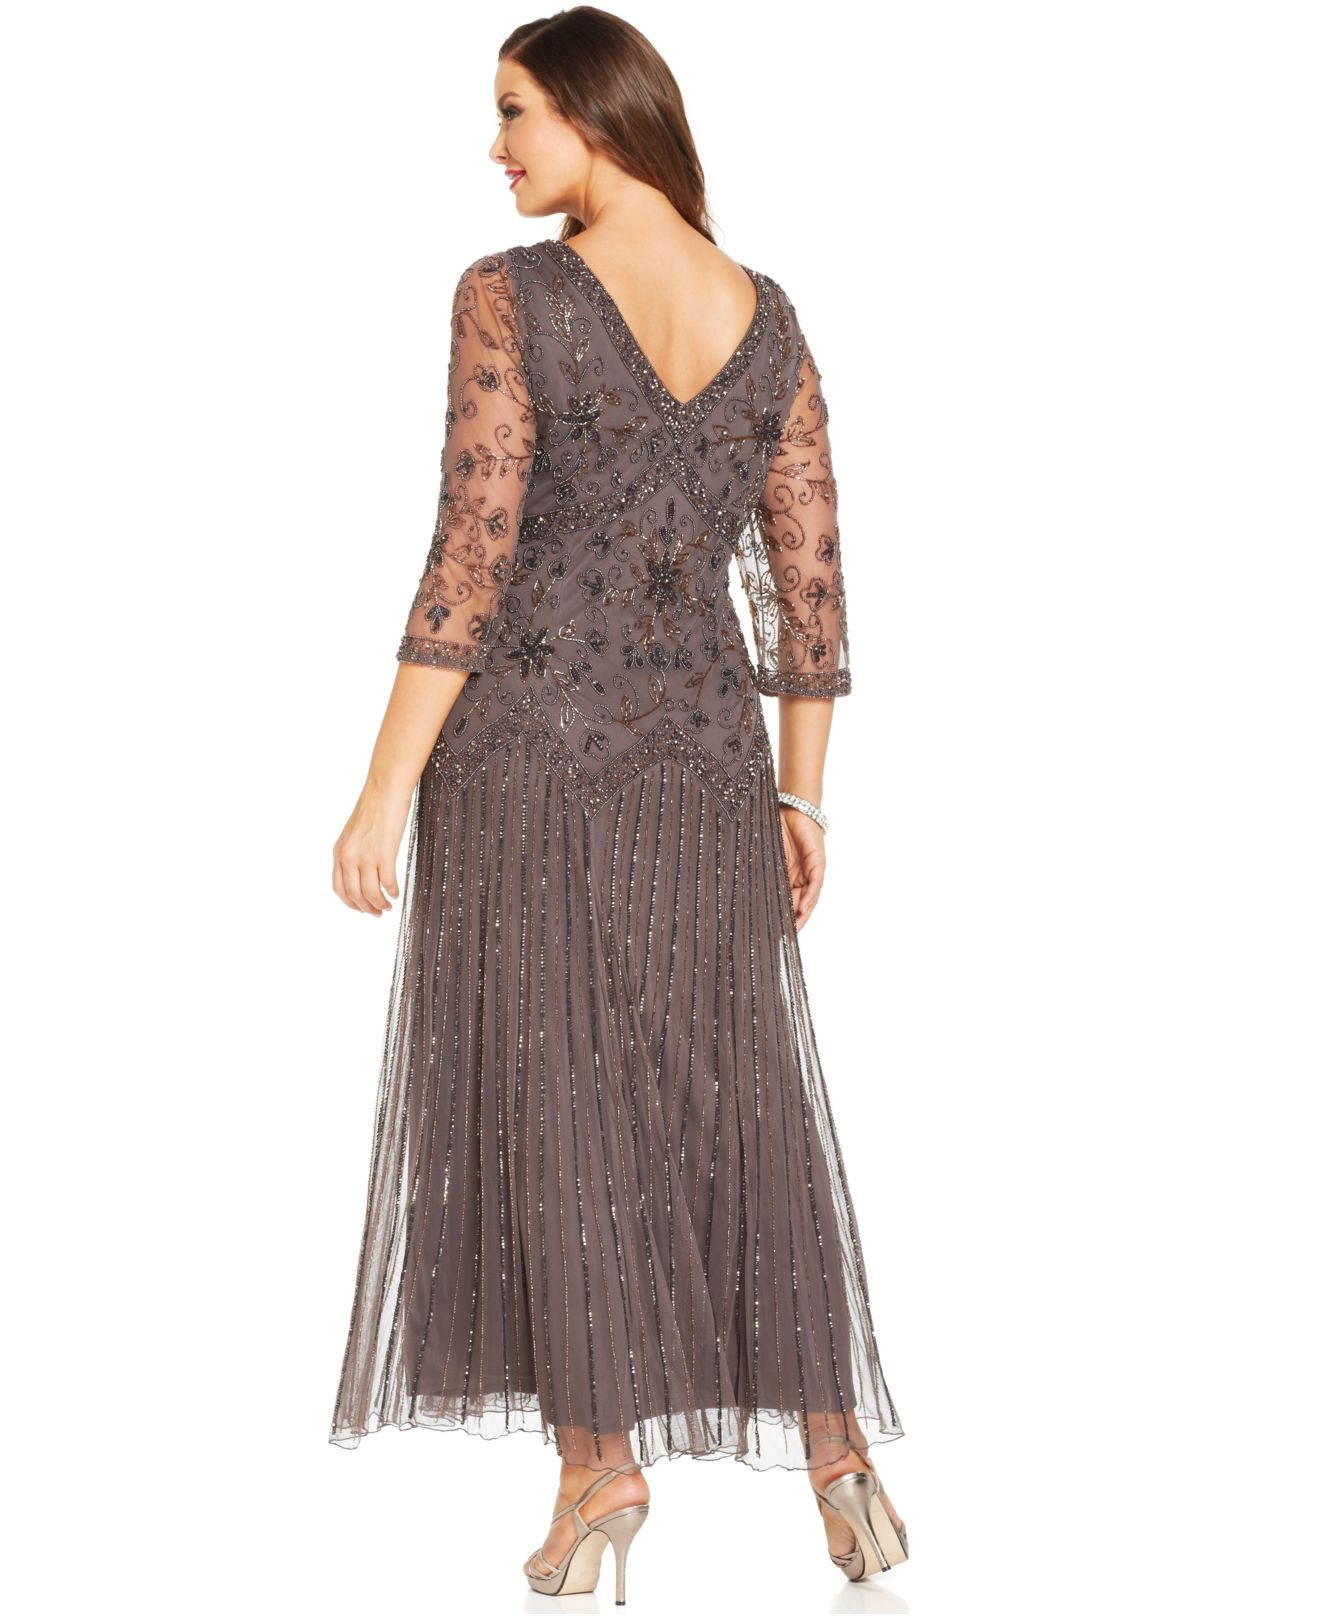 Lyst - Pisarro Nights Plus Size Three-Quarter-Sleeve Beaded Gown in Gray